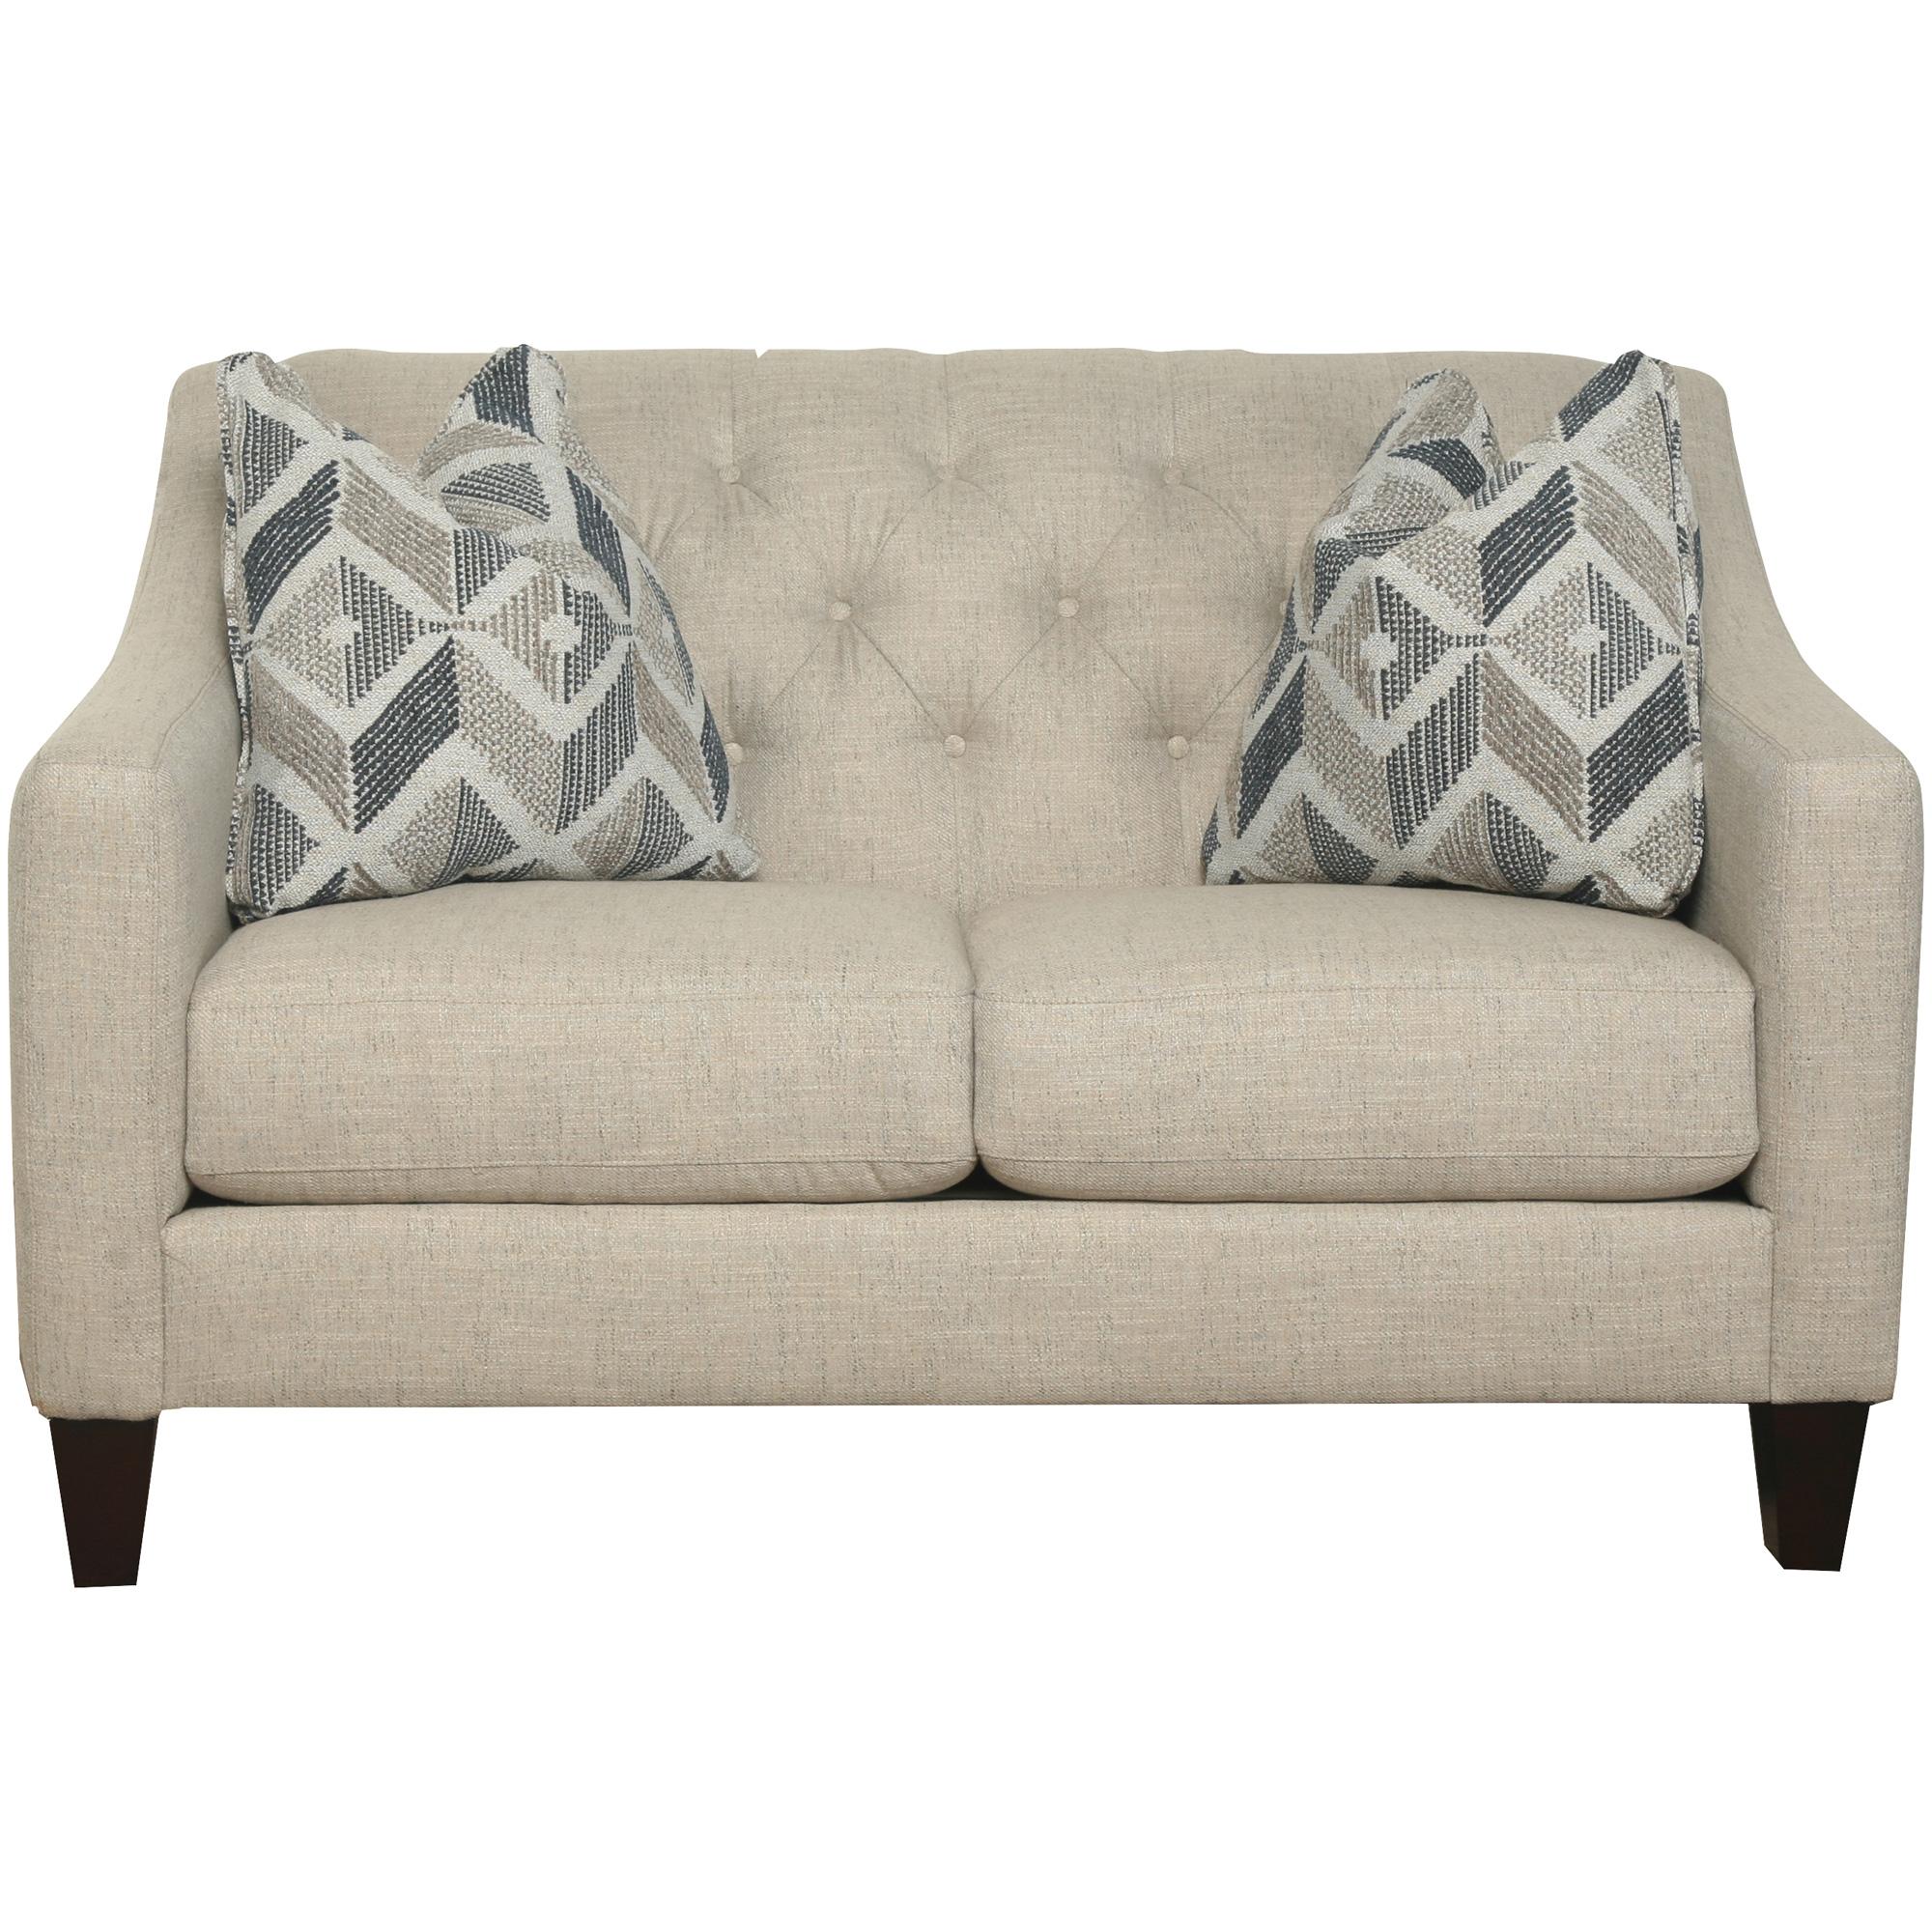 Bauhaus Furniture   Solo Burlap Loveseat Sofa